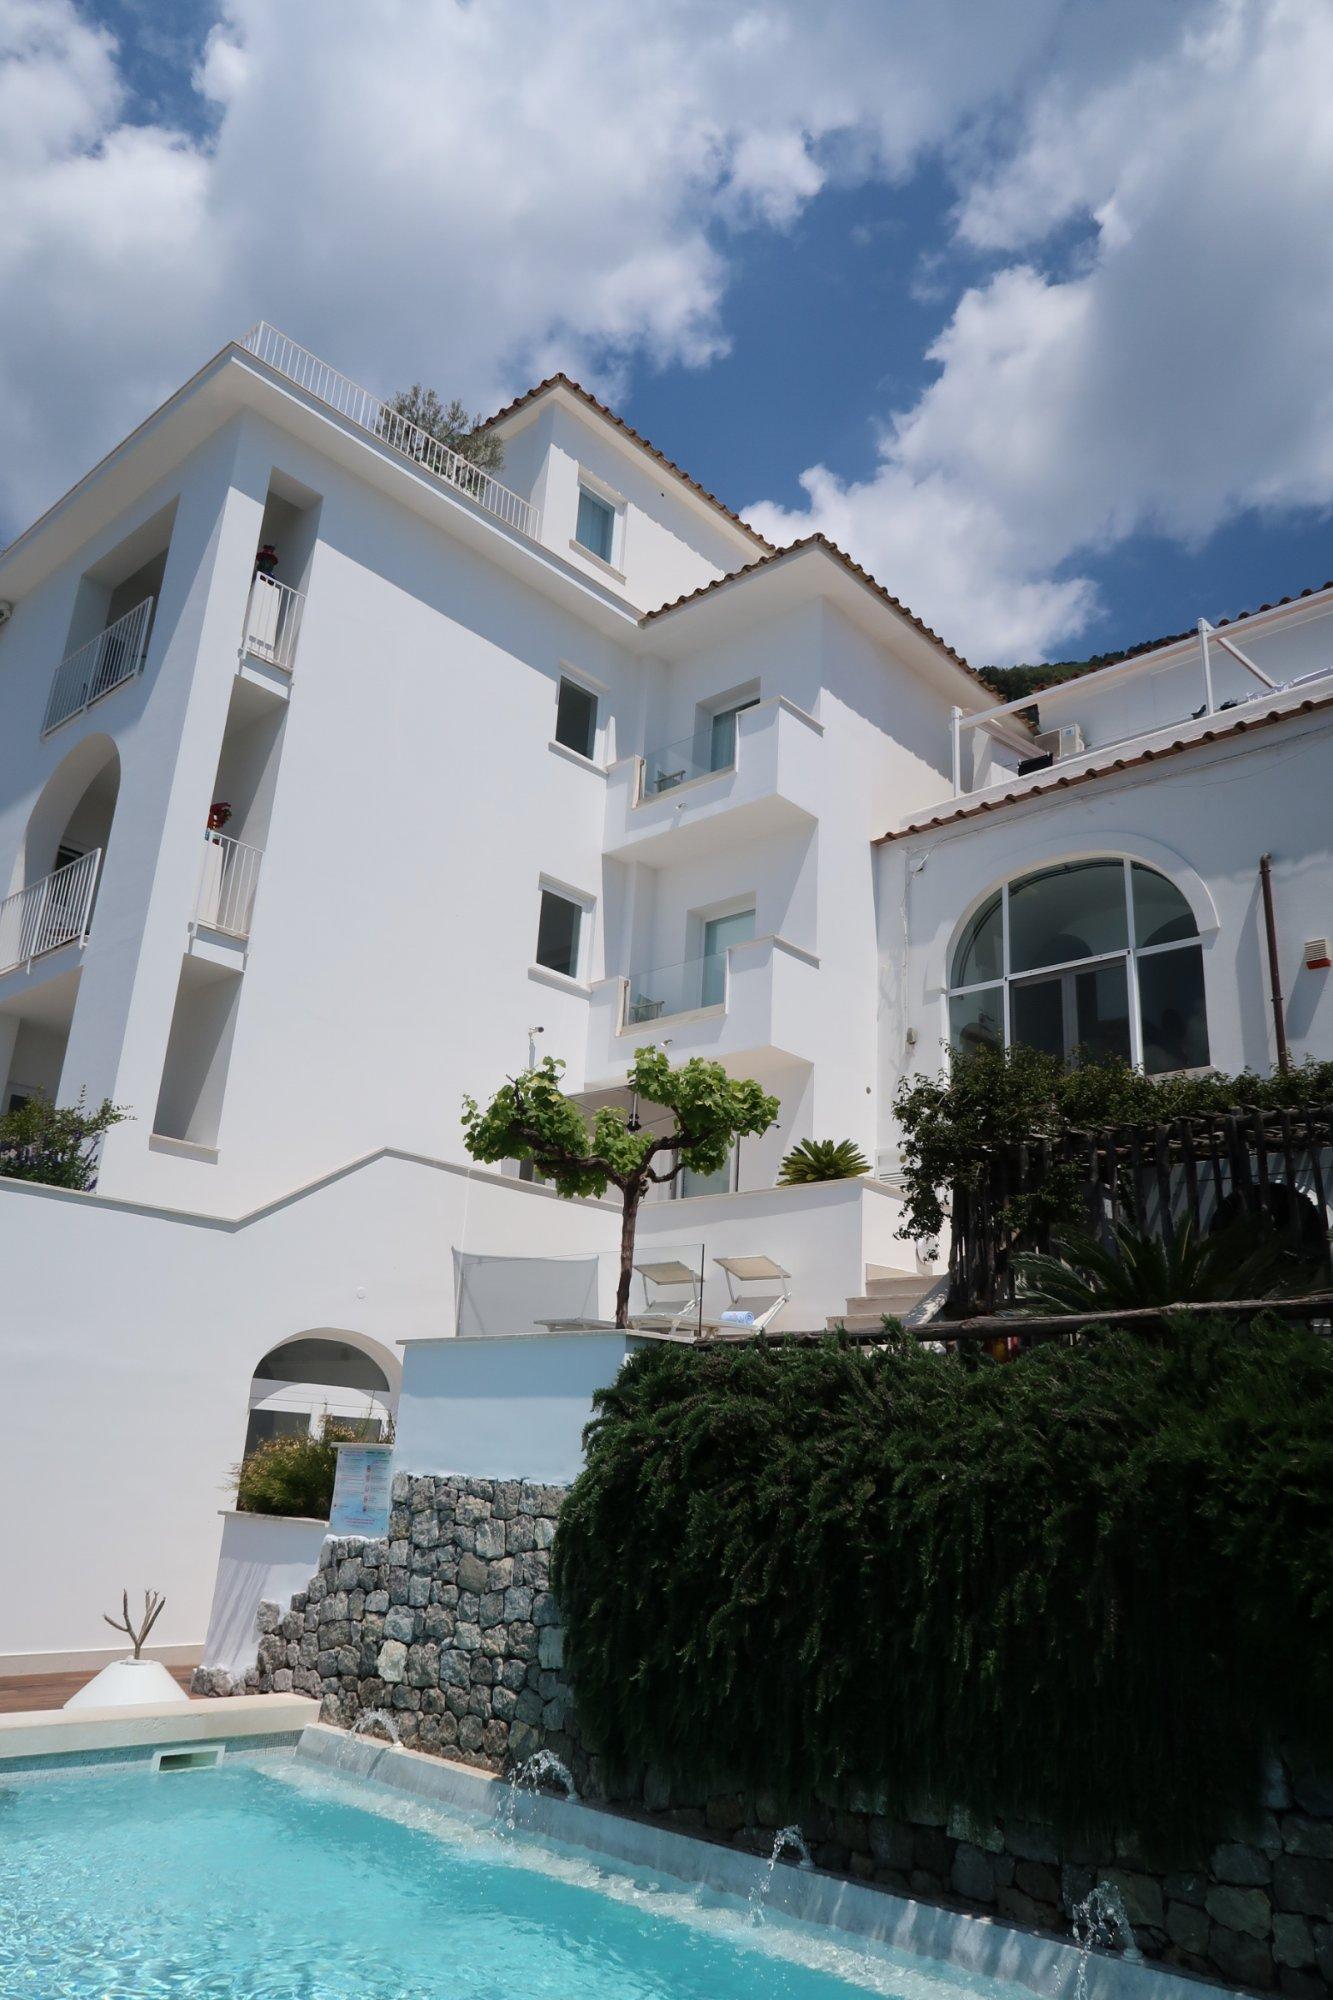 Casa Angelina: Perfect Praiano.